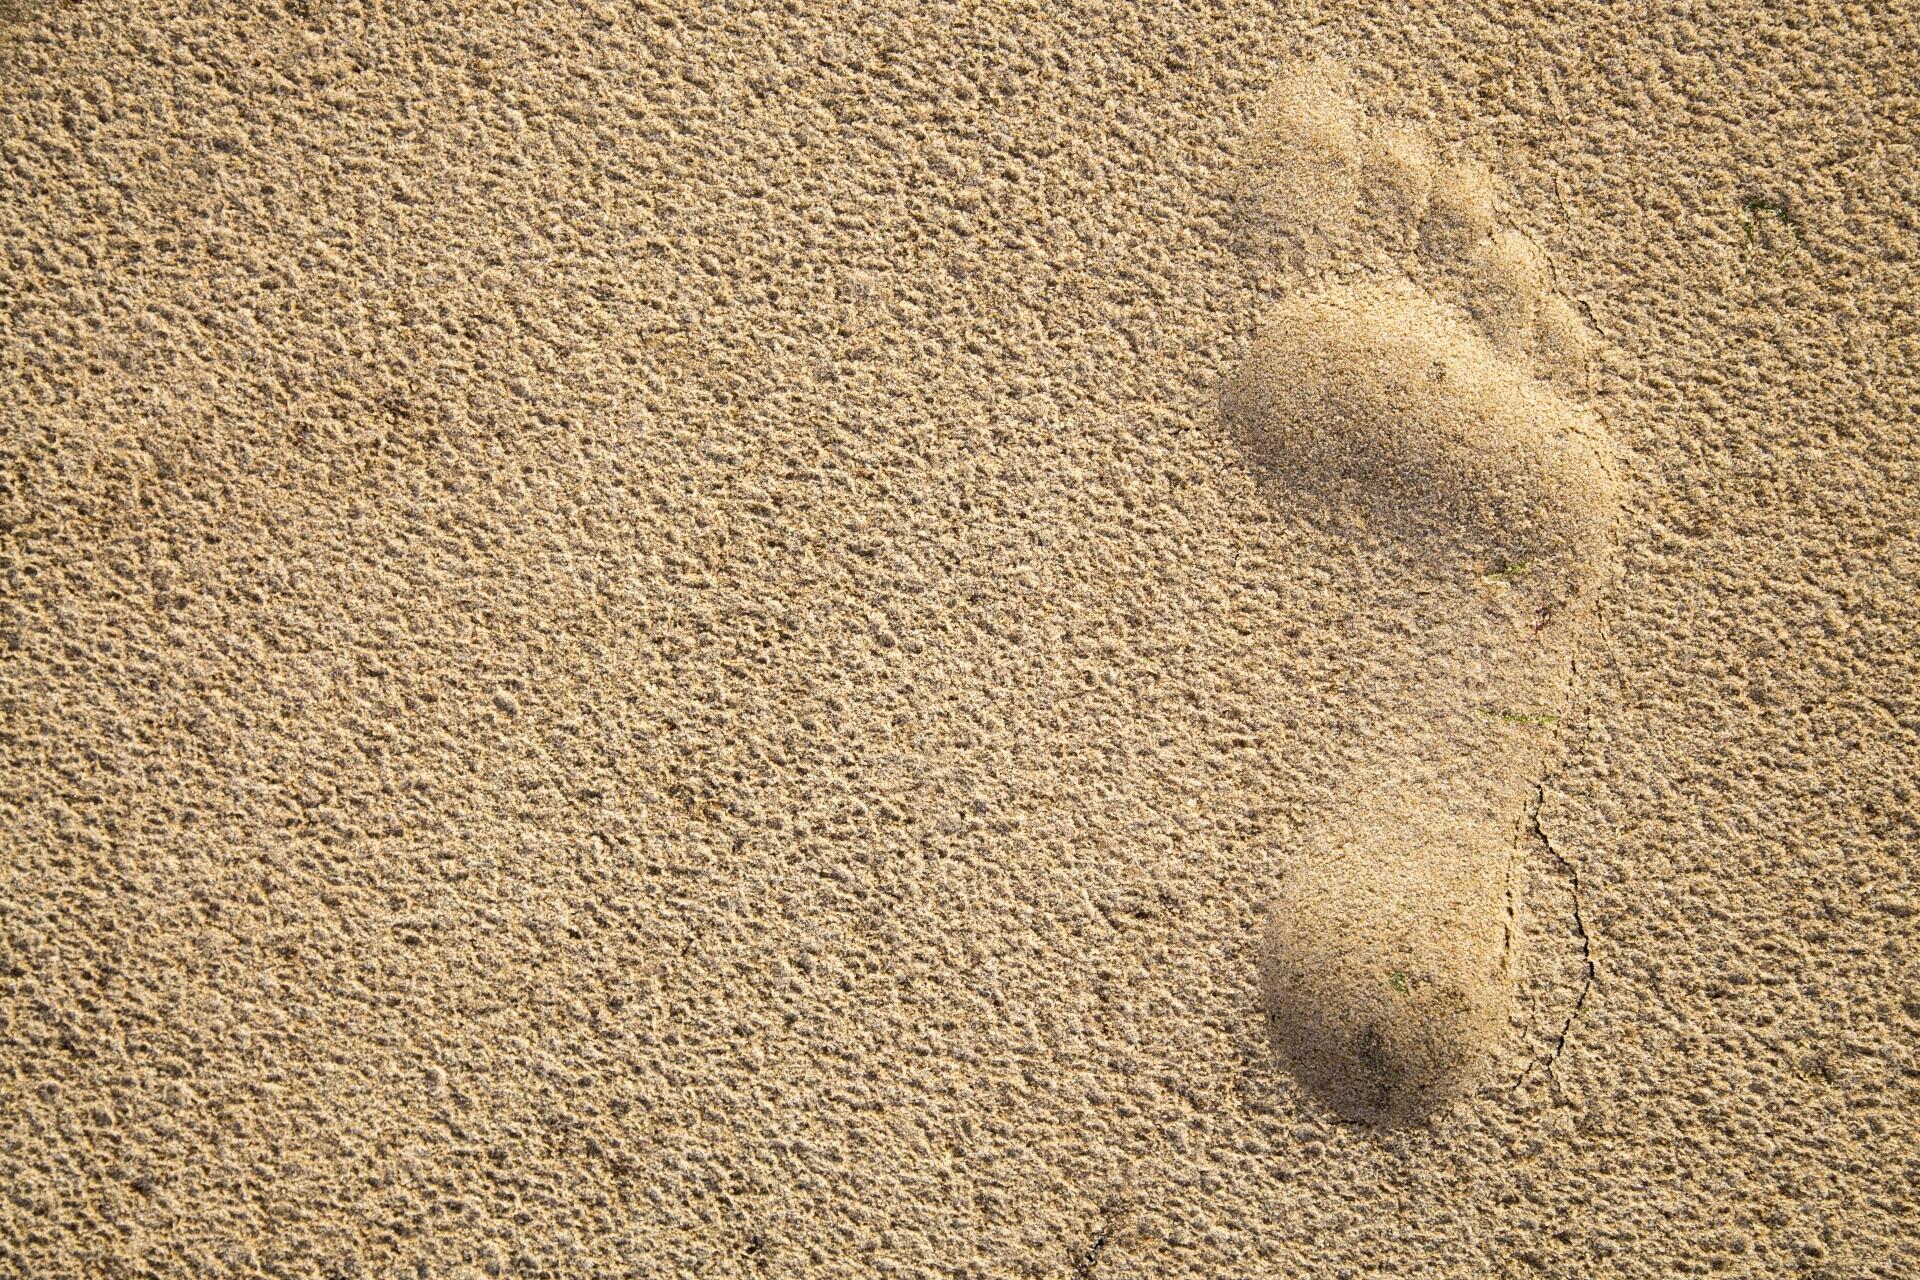 single-footprint-in-sand-1471795859RtX